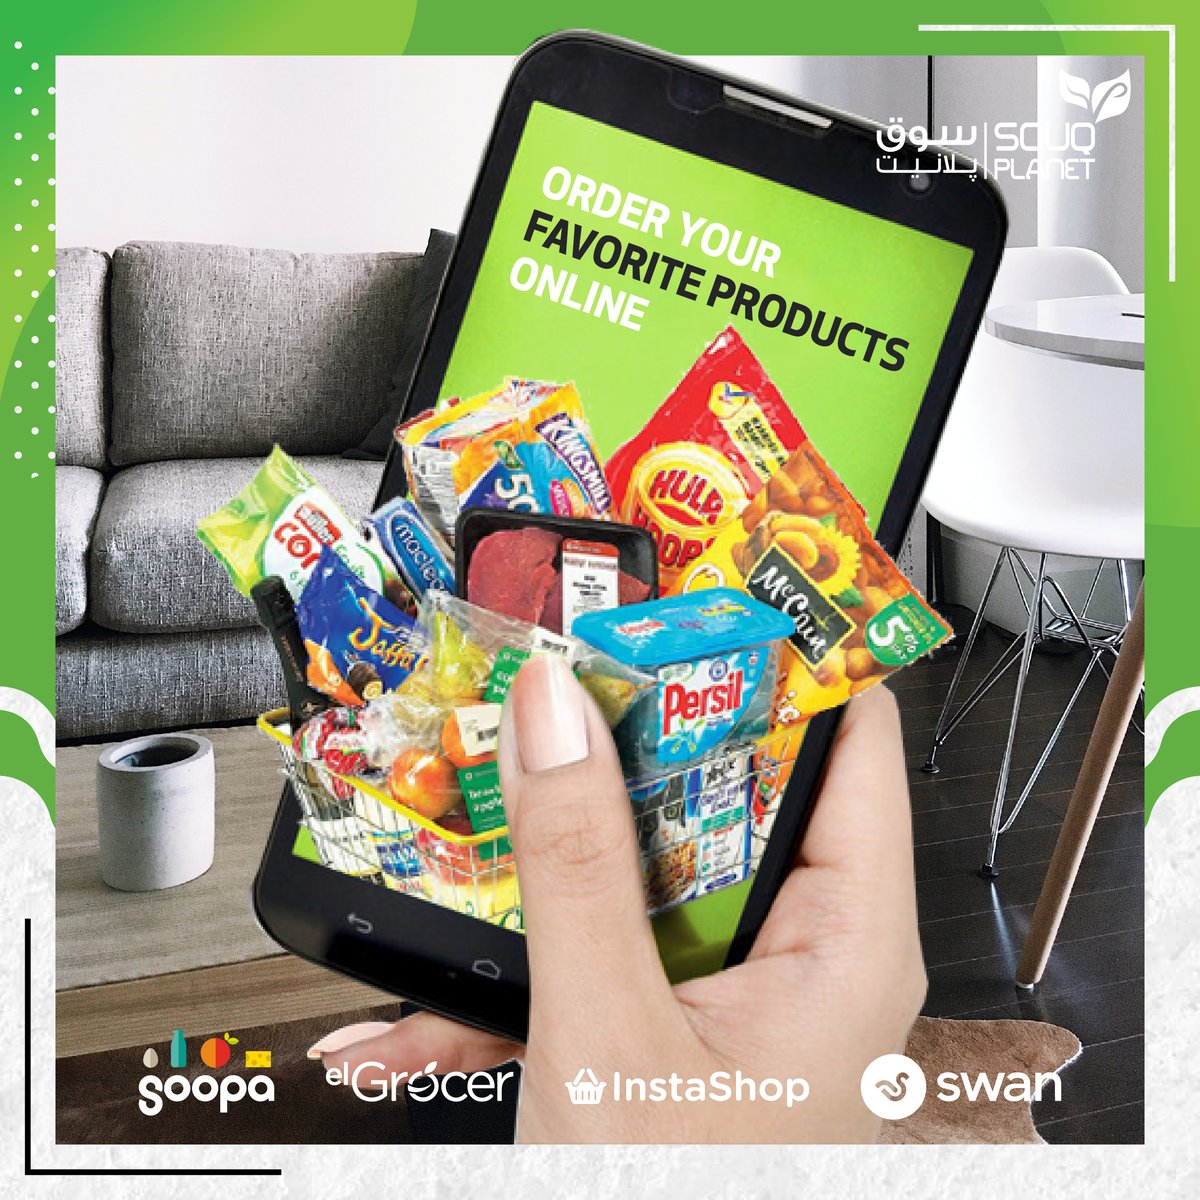 Your favorite Souq Planet groceries… One tap away. Order today!😍   #souqplanet #smartshopper #onlineshopping #groceryshopping #inabudhabi #dubai #alain #uae #vegan #madinatzayed #safeplanet #stayhome #socialdistancing https://t.co/3Ge8JMh86B